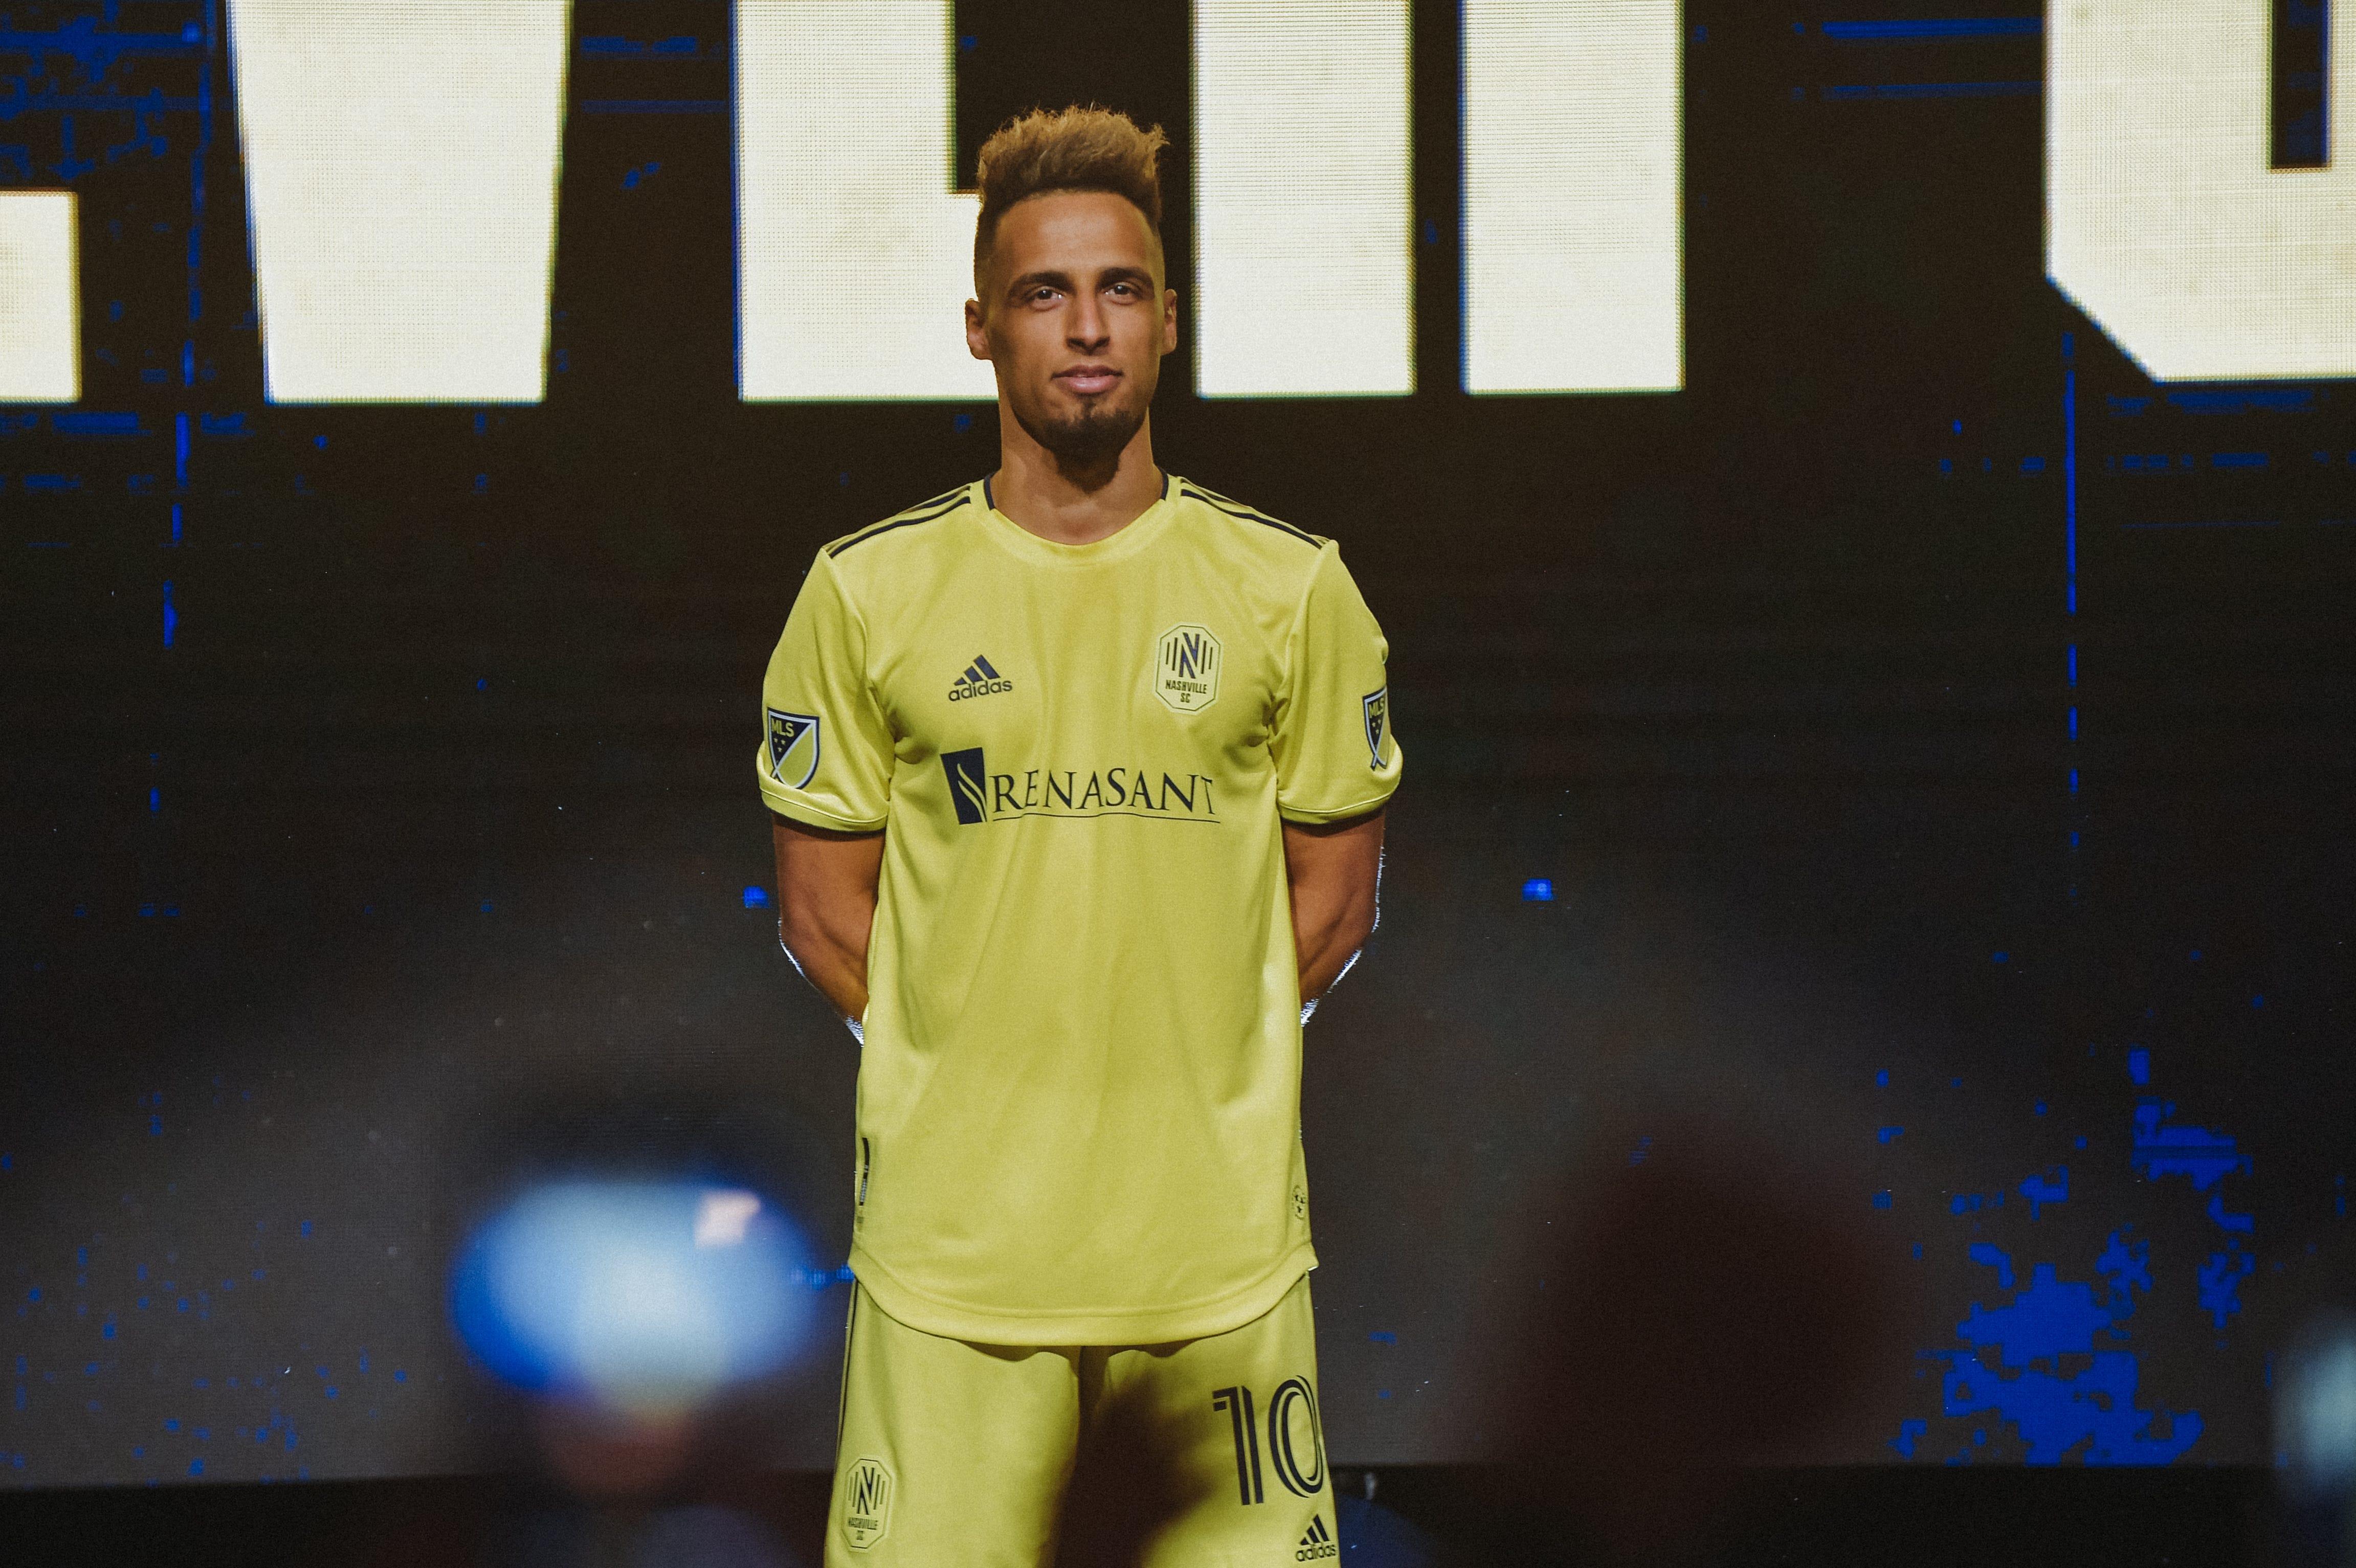 Nashville SC unveils its primary uniform for debut in 2020 Major League Soccer season